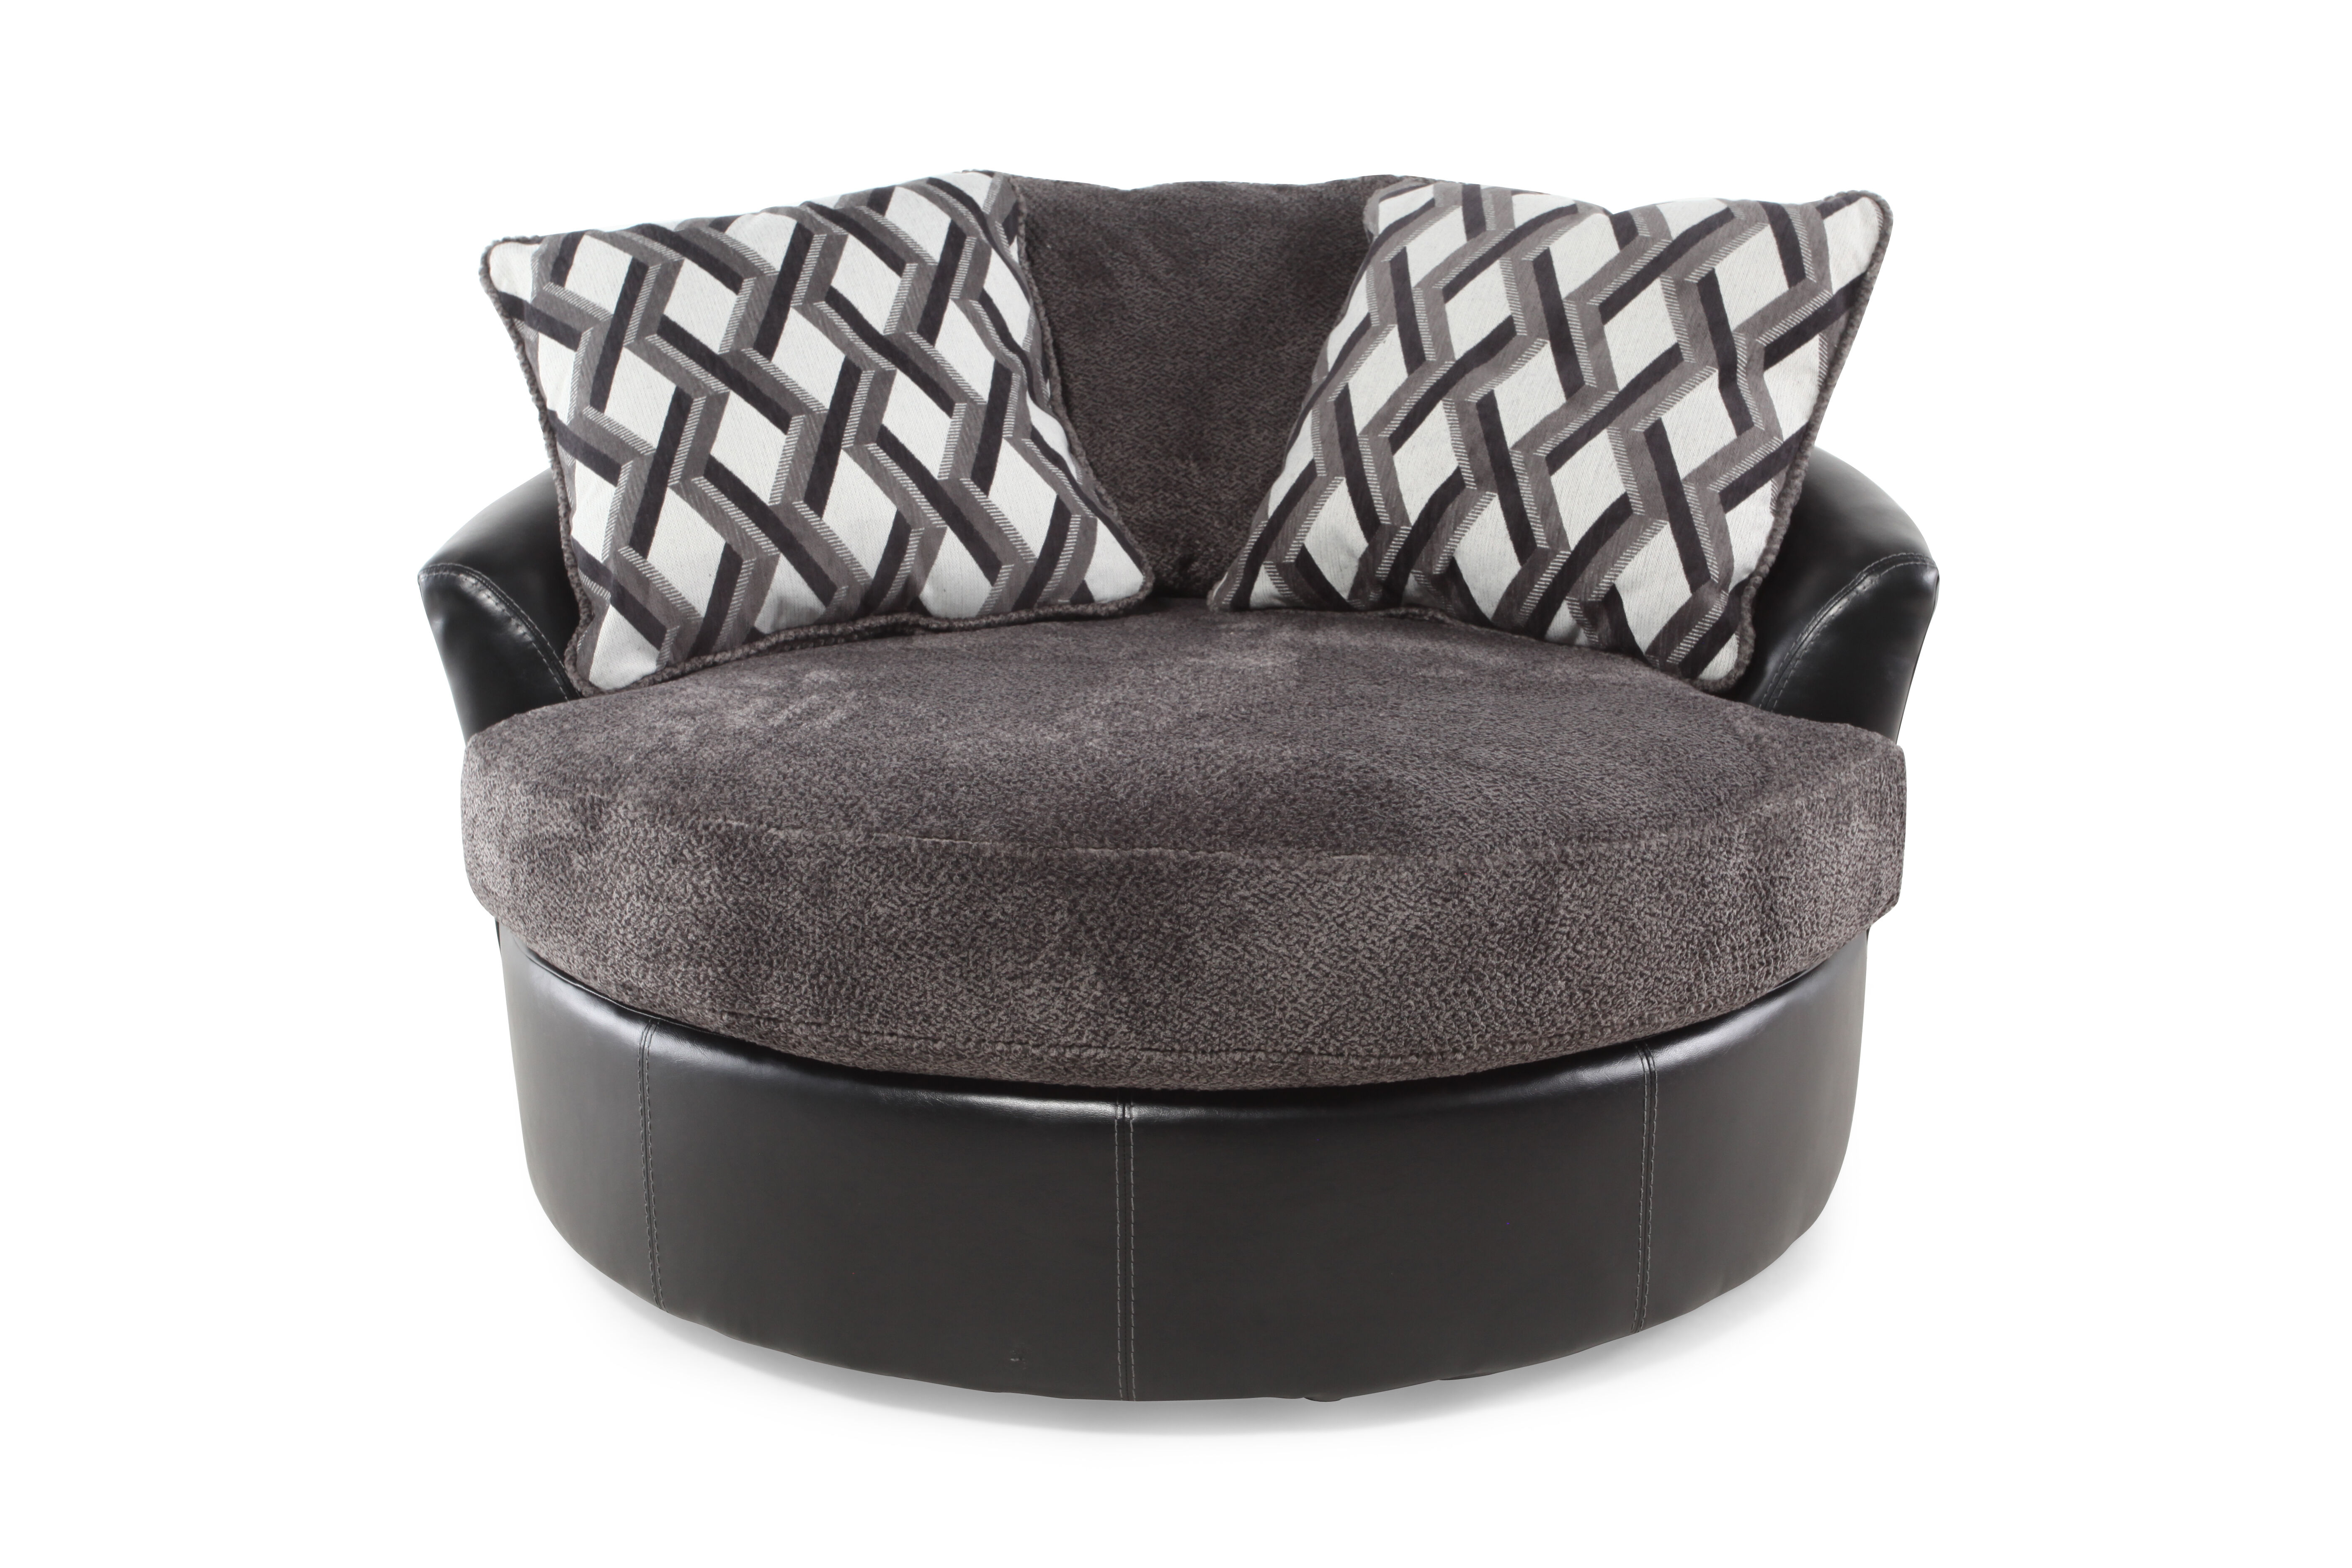 Images Oversized Microfiber 58u0026quot; Swivel Accent Chair in Smoke Gray Oversized Microfiber 58u0026quot; Swivel Accent Chair in Smoke Gray  sc 1 st  Mathis Brothers & Oversized Microfiber 58